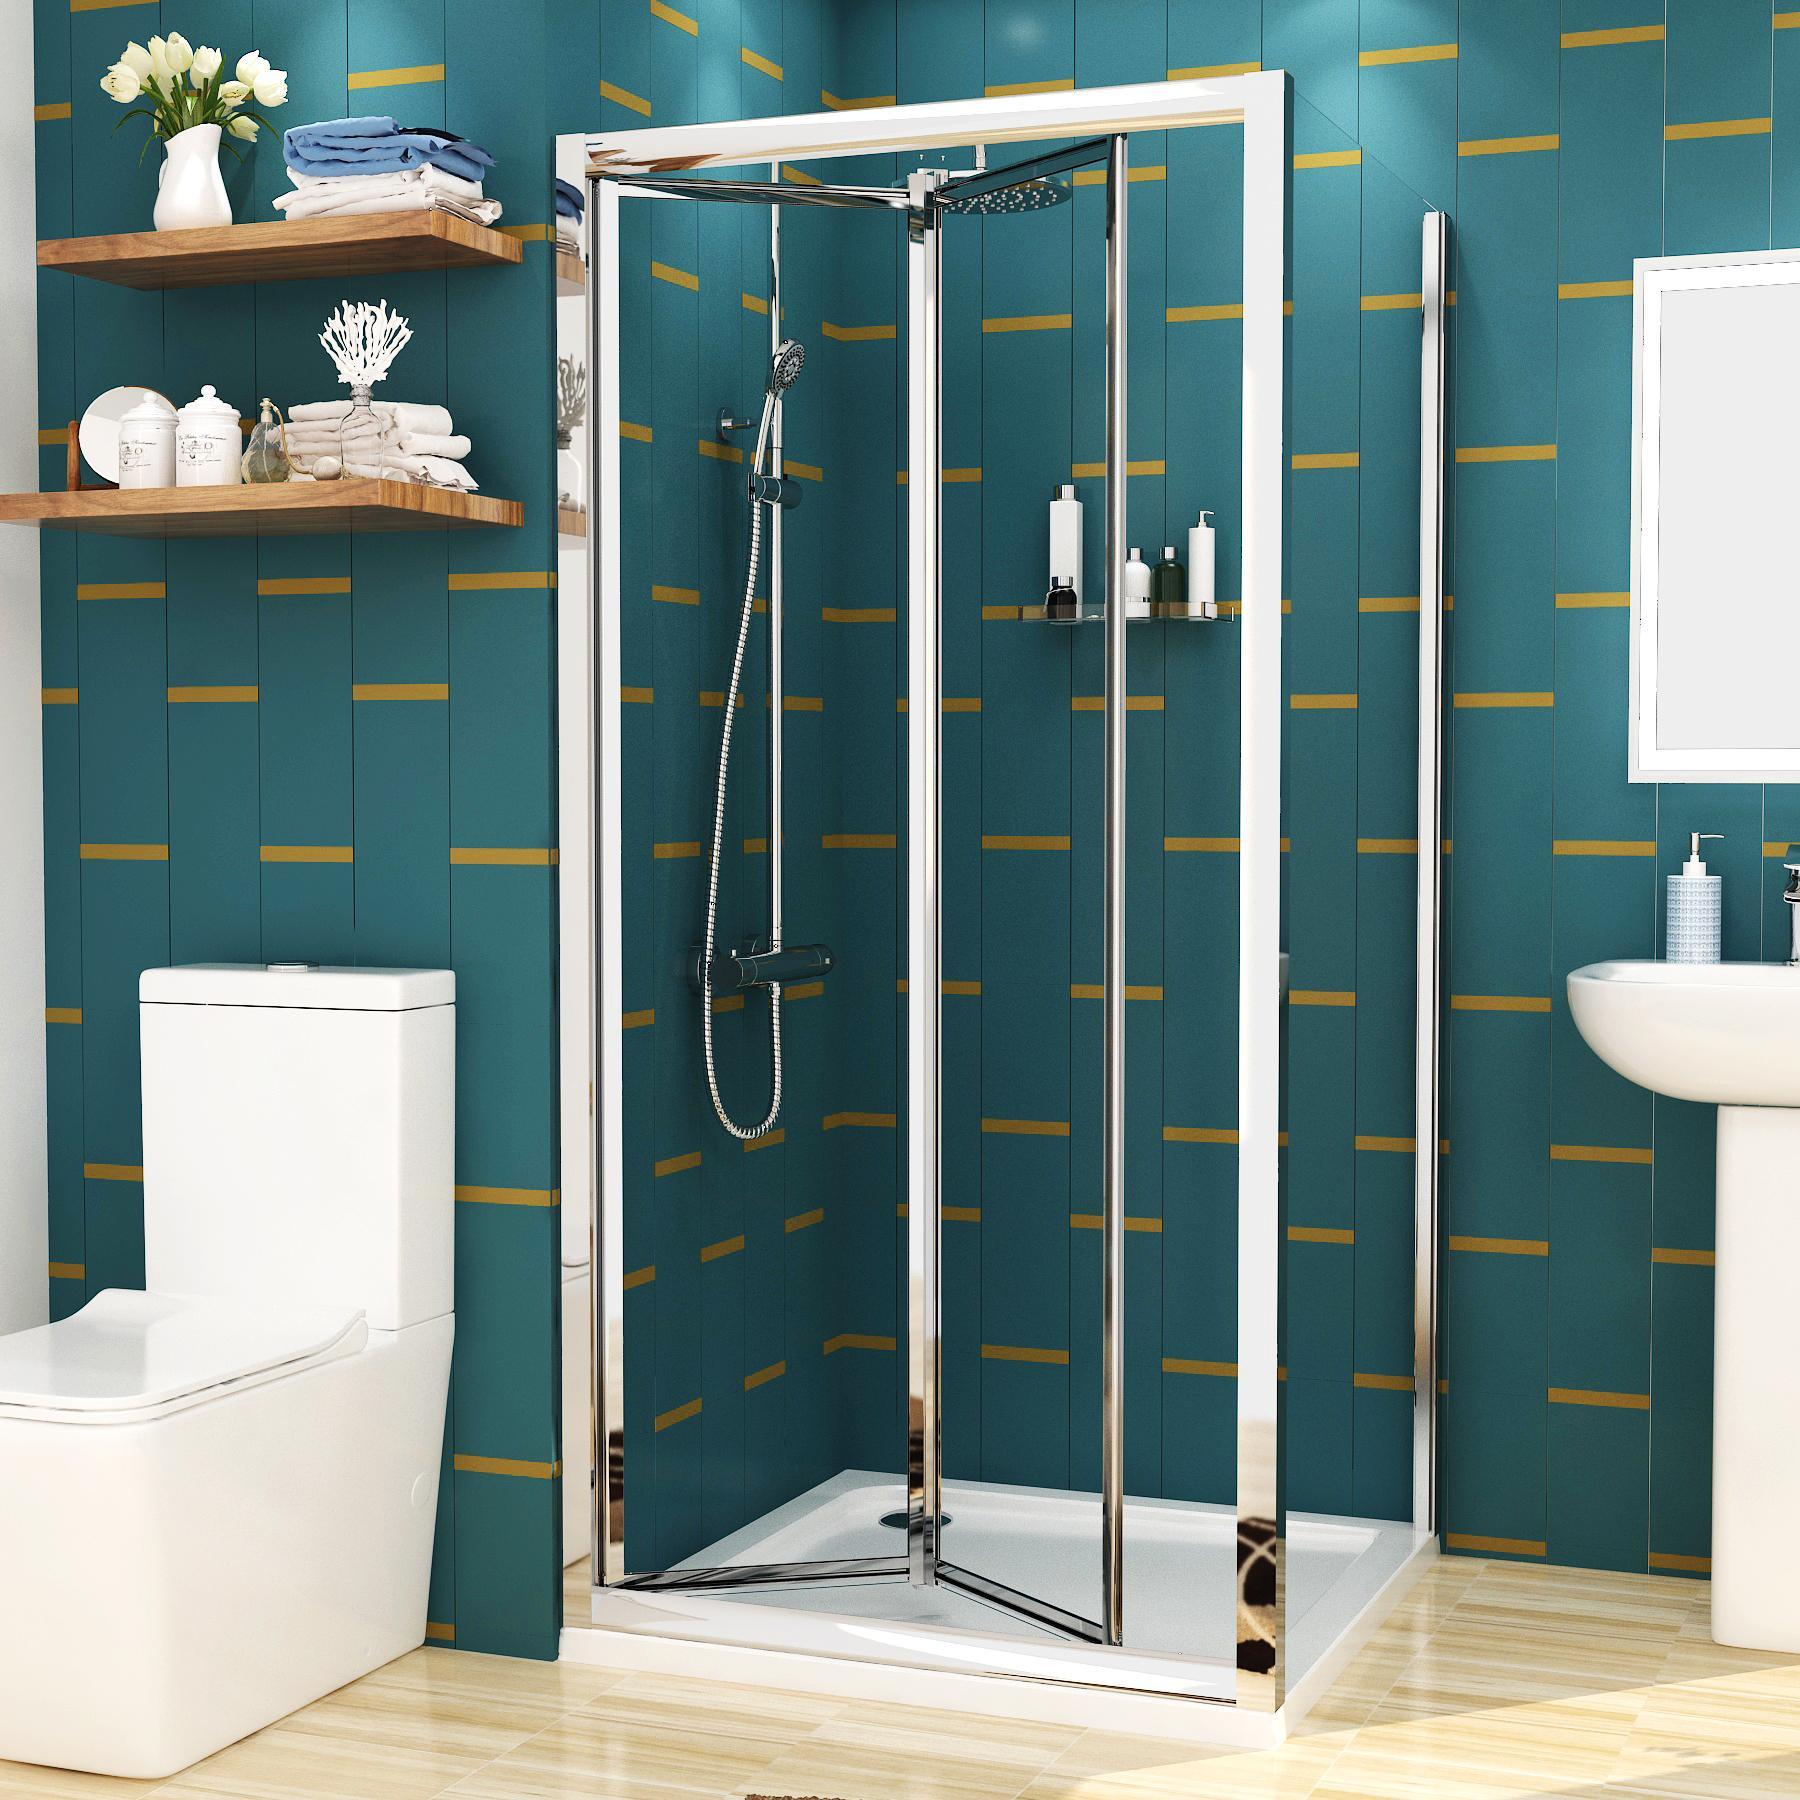 Royal Bathrooms Elite 800 x 800mm Square Bi-fold Shower Enclosure 4mm Glass